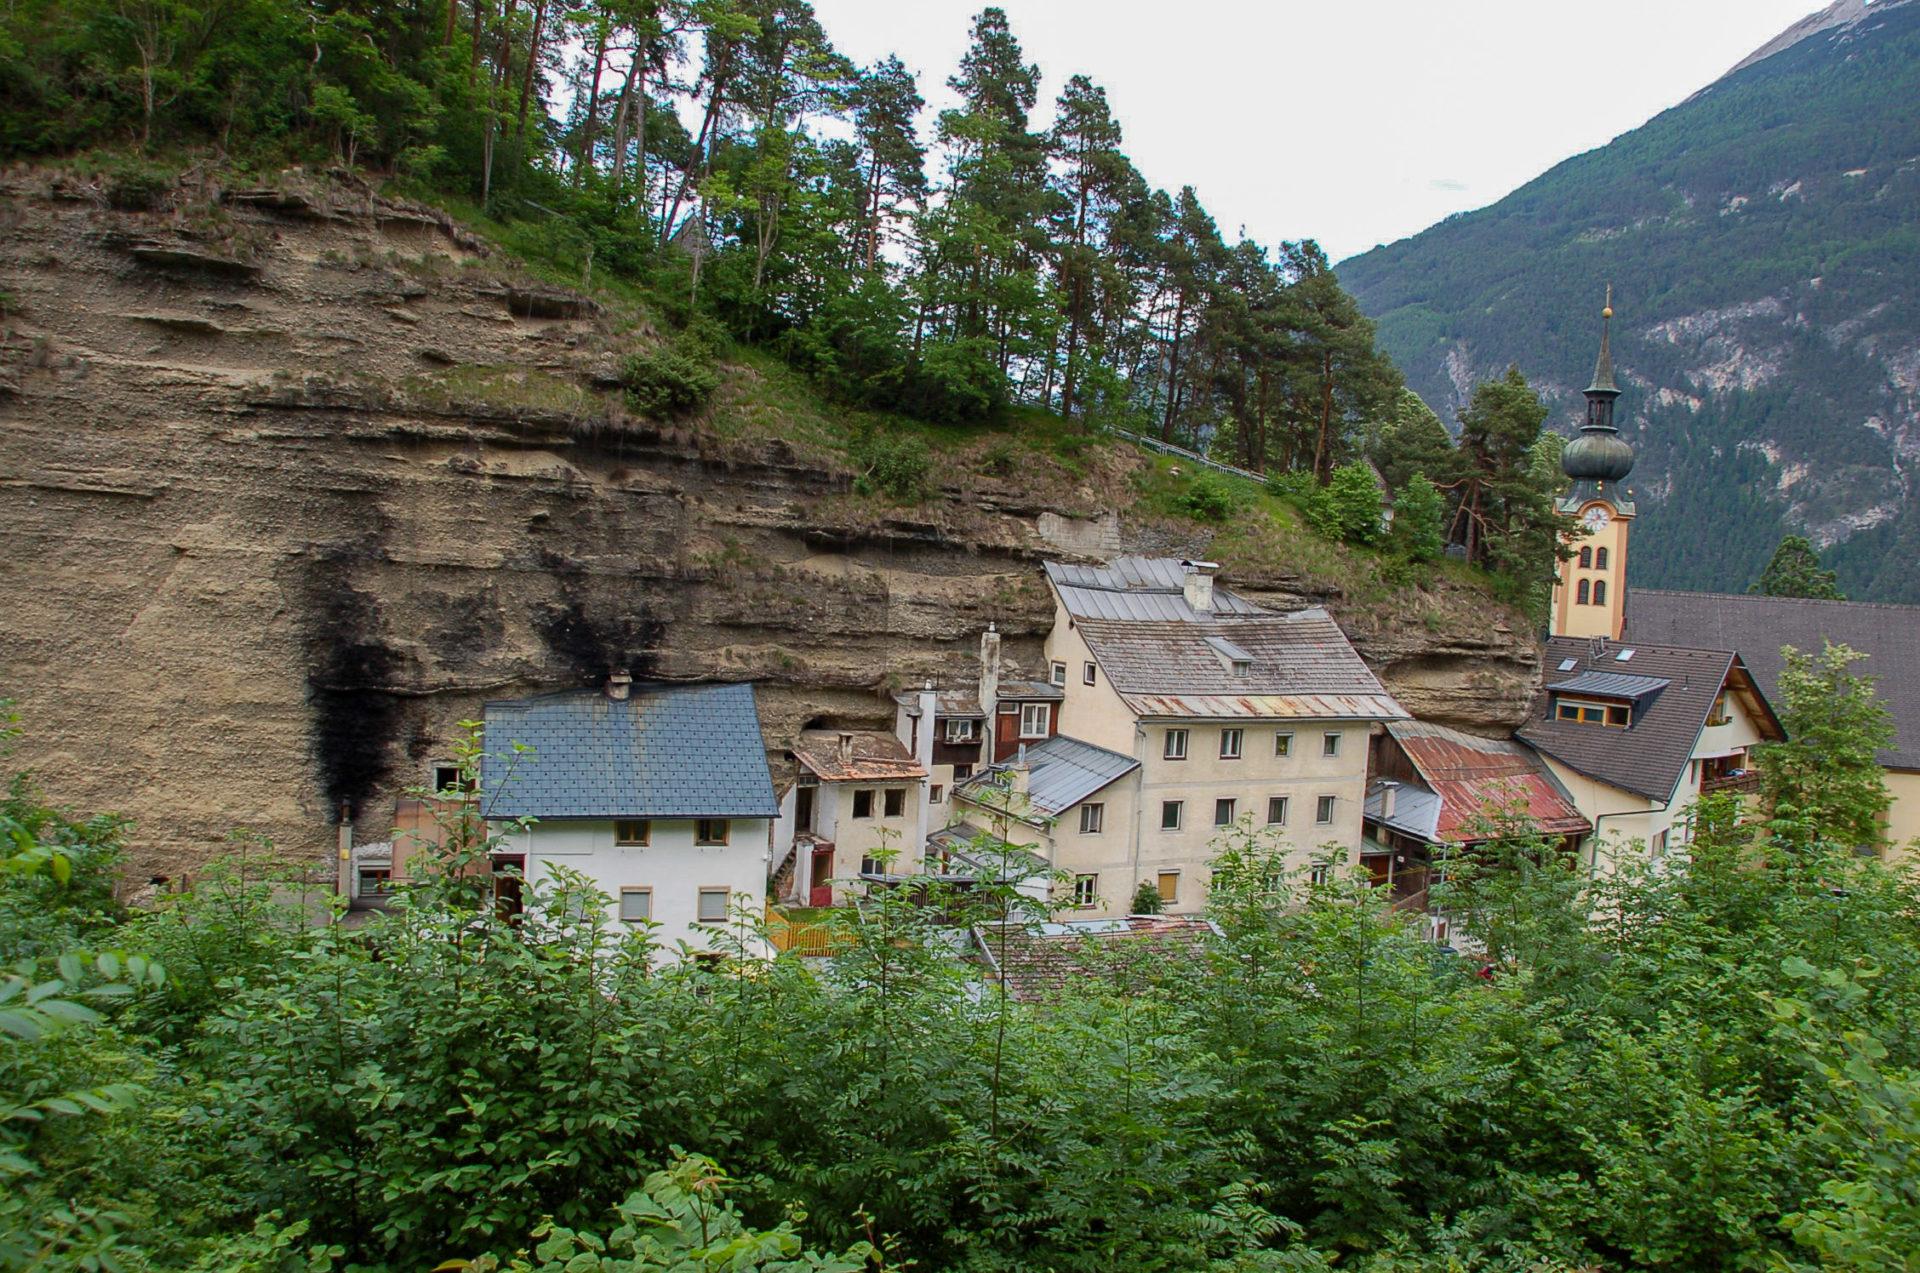 Felsenbehausungen im Ort Imst in Tirol, dem Startpunkt unserer Reise über den Inntalradweg in Tirol